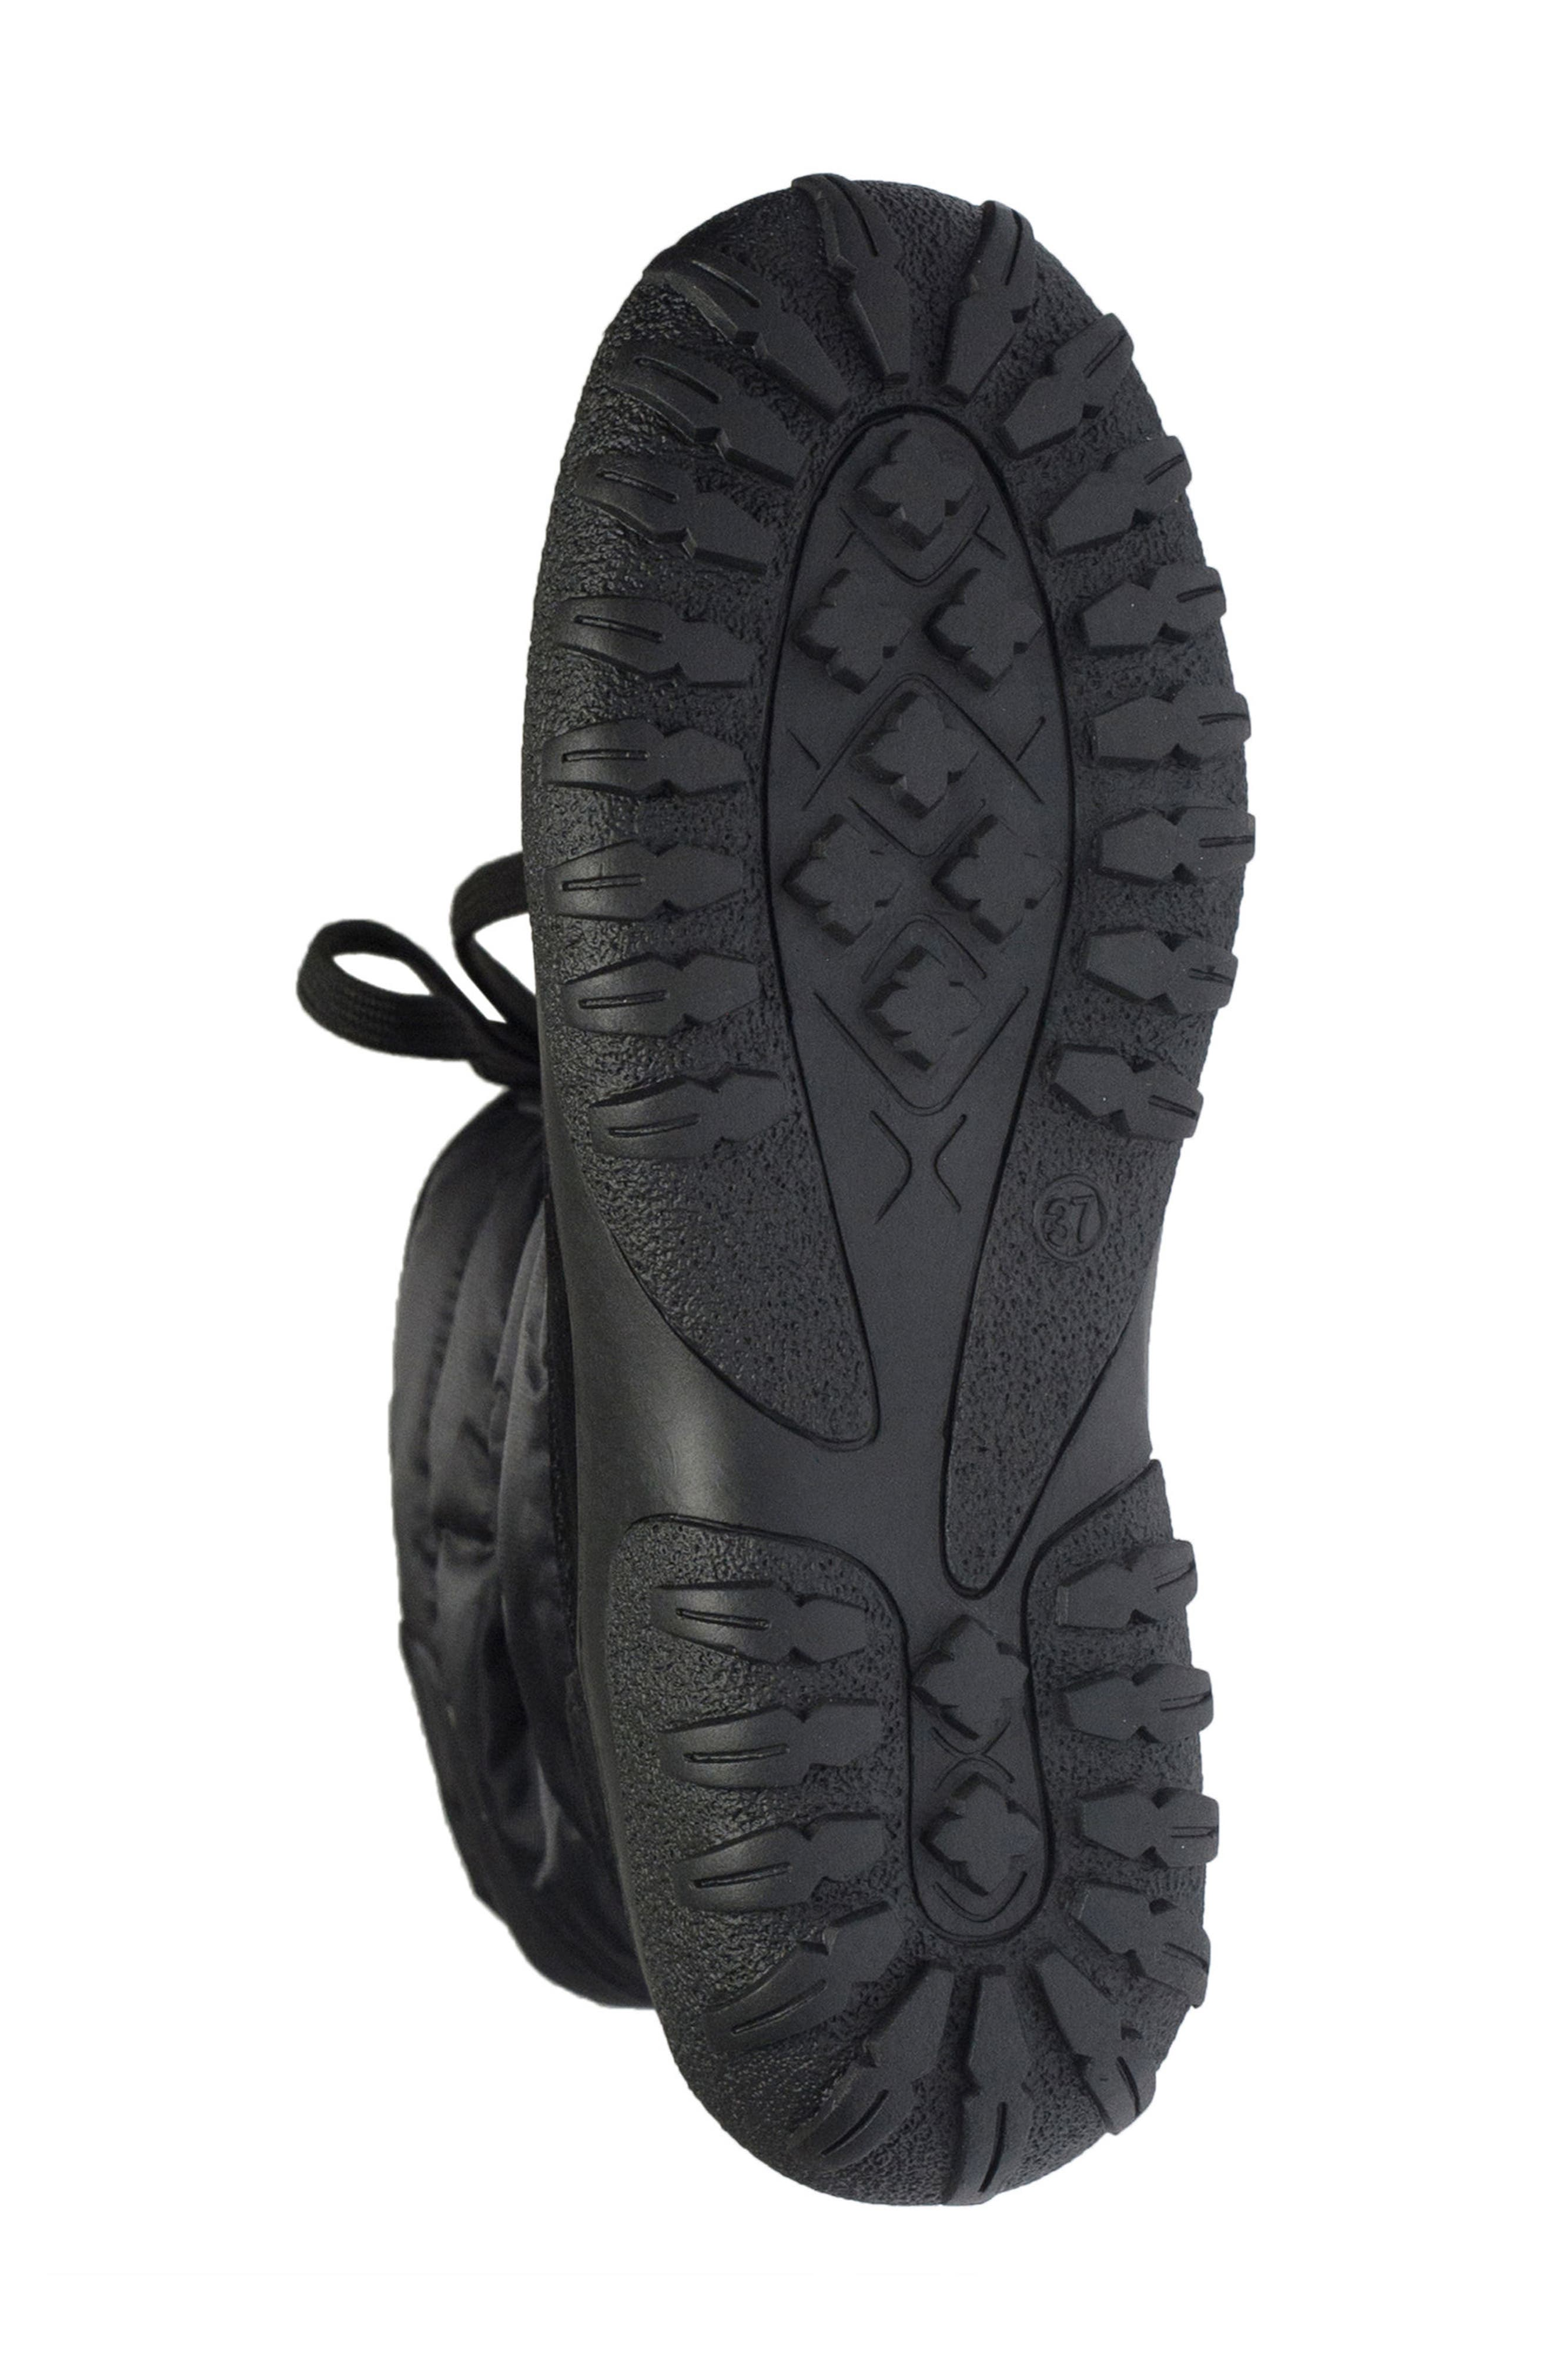 Lucerne Waterproof Drawstring Boot,                             Alternate thumbnail 5, color,                             Black